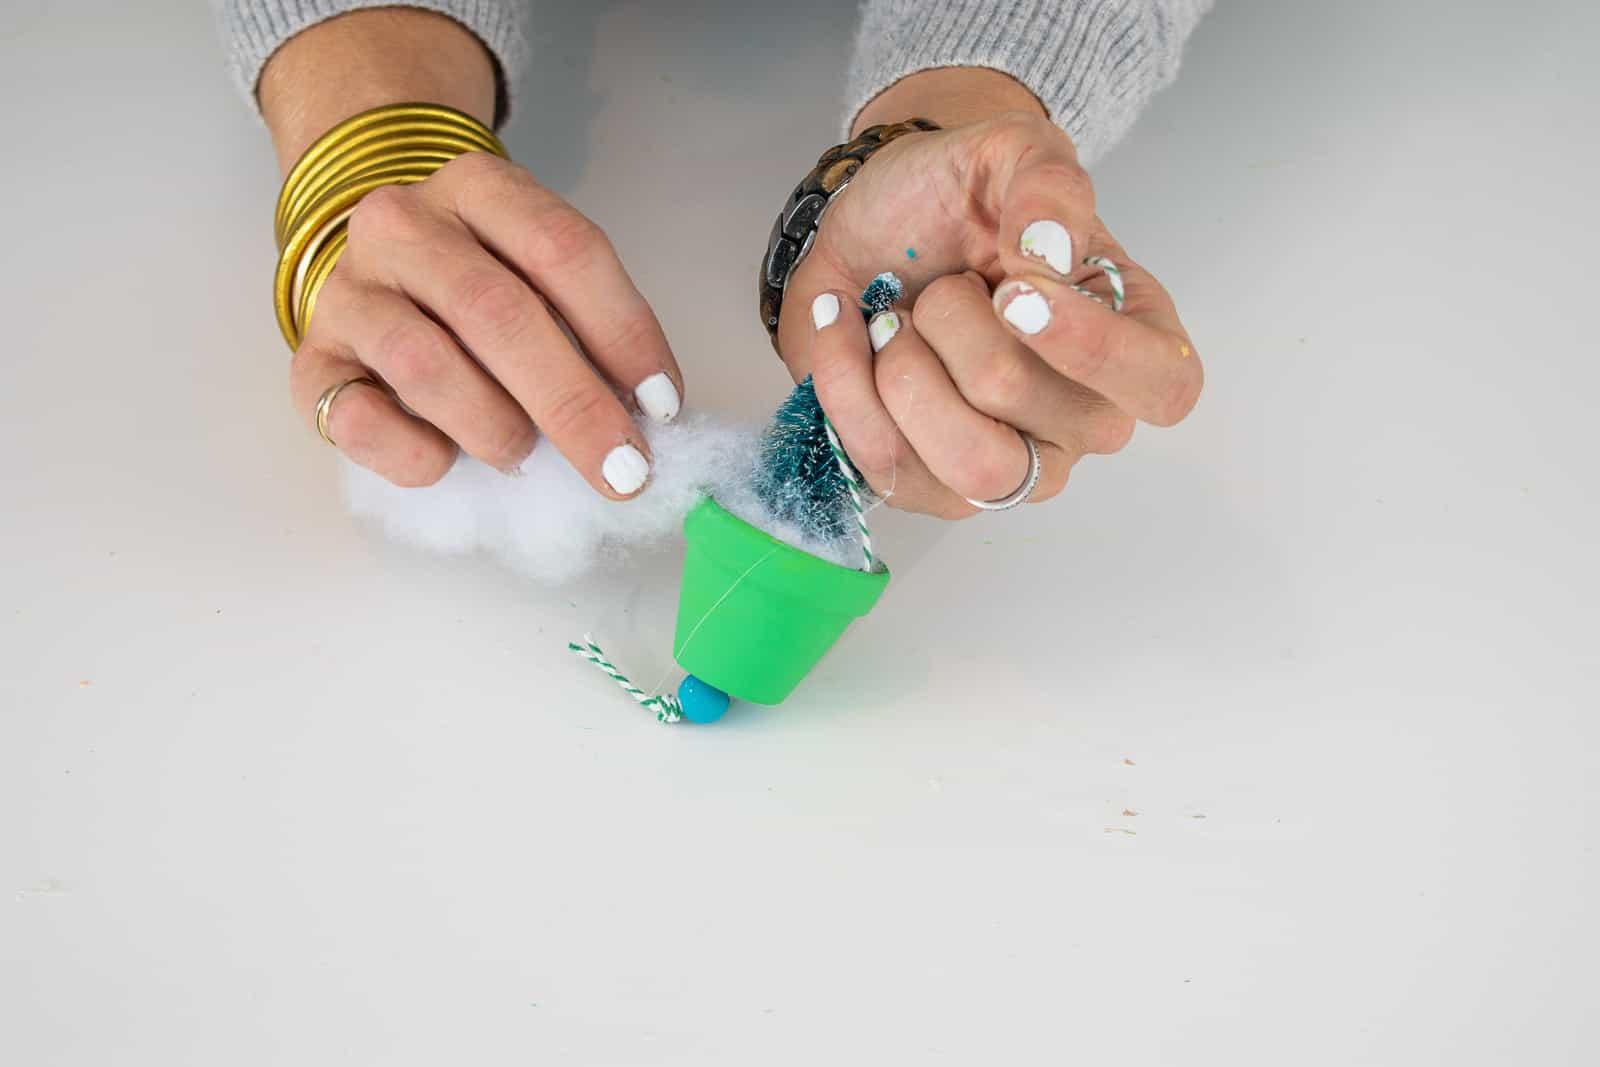 add polyfill around bottle brush base